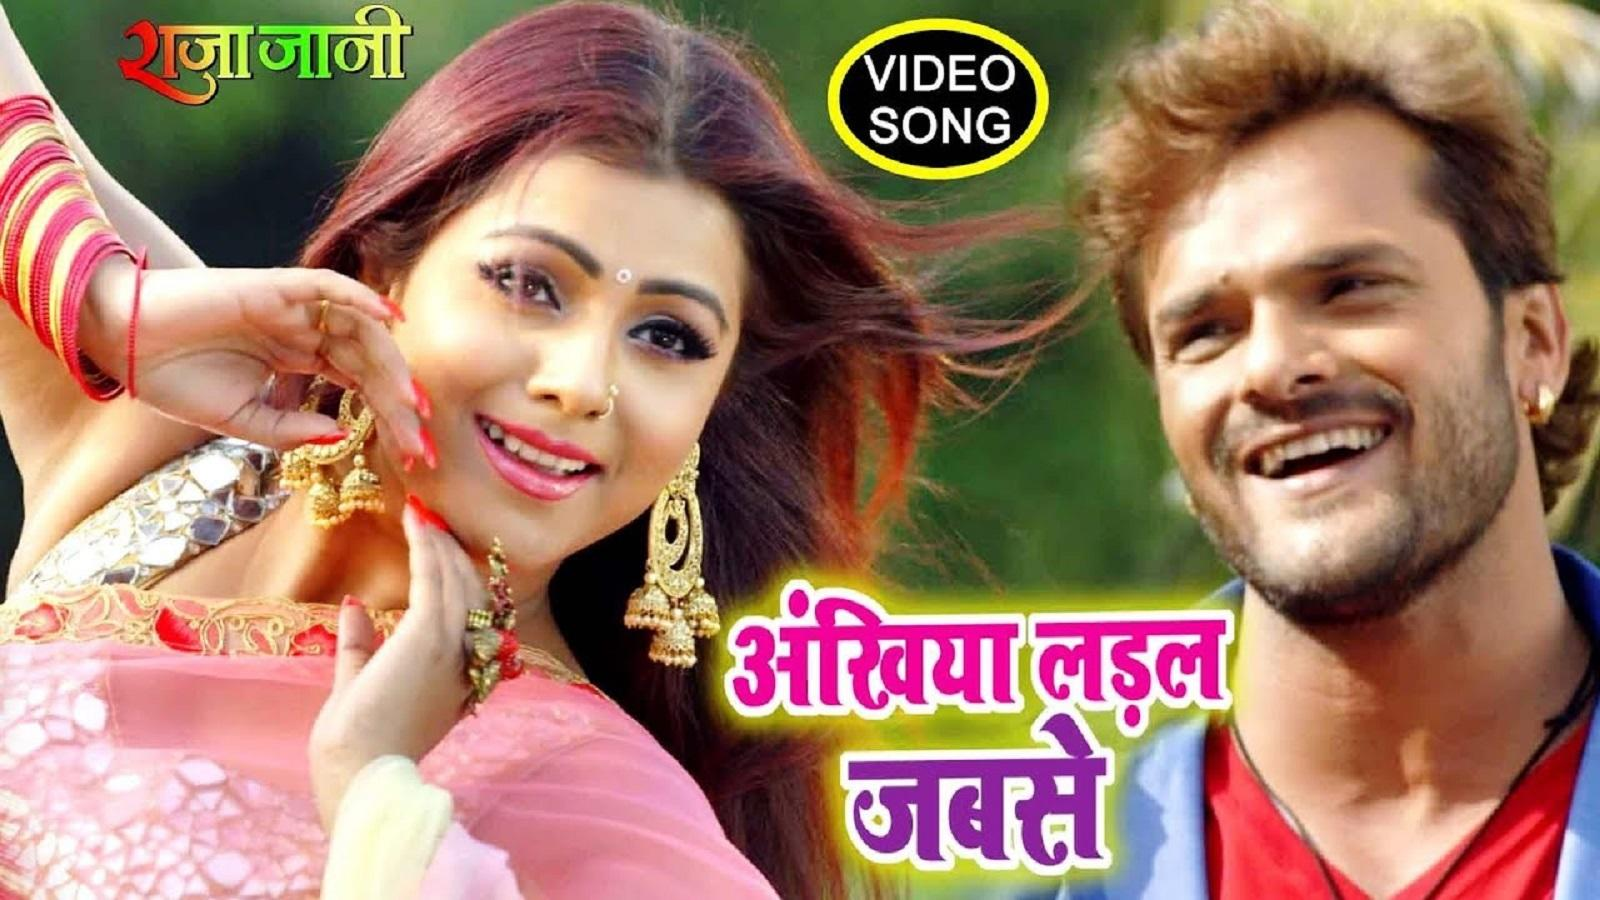 Khesari Lal Yadav Bhojpuri Song Videos: Bhojpuri Gana Video Song 'Ankhiya Ladal Jabse' Ft. Khesari Lal Yadav and Priti Biswas